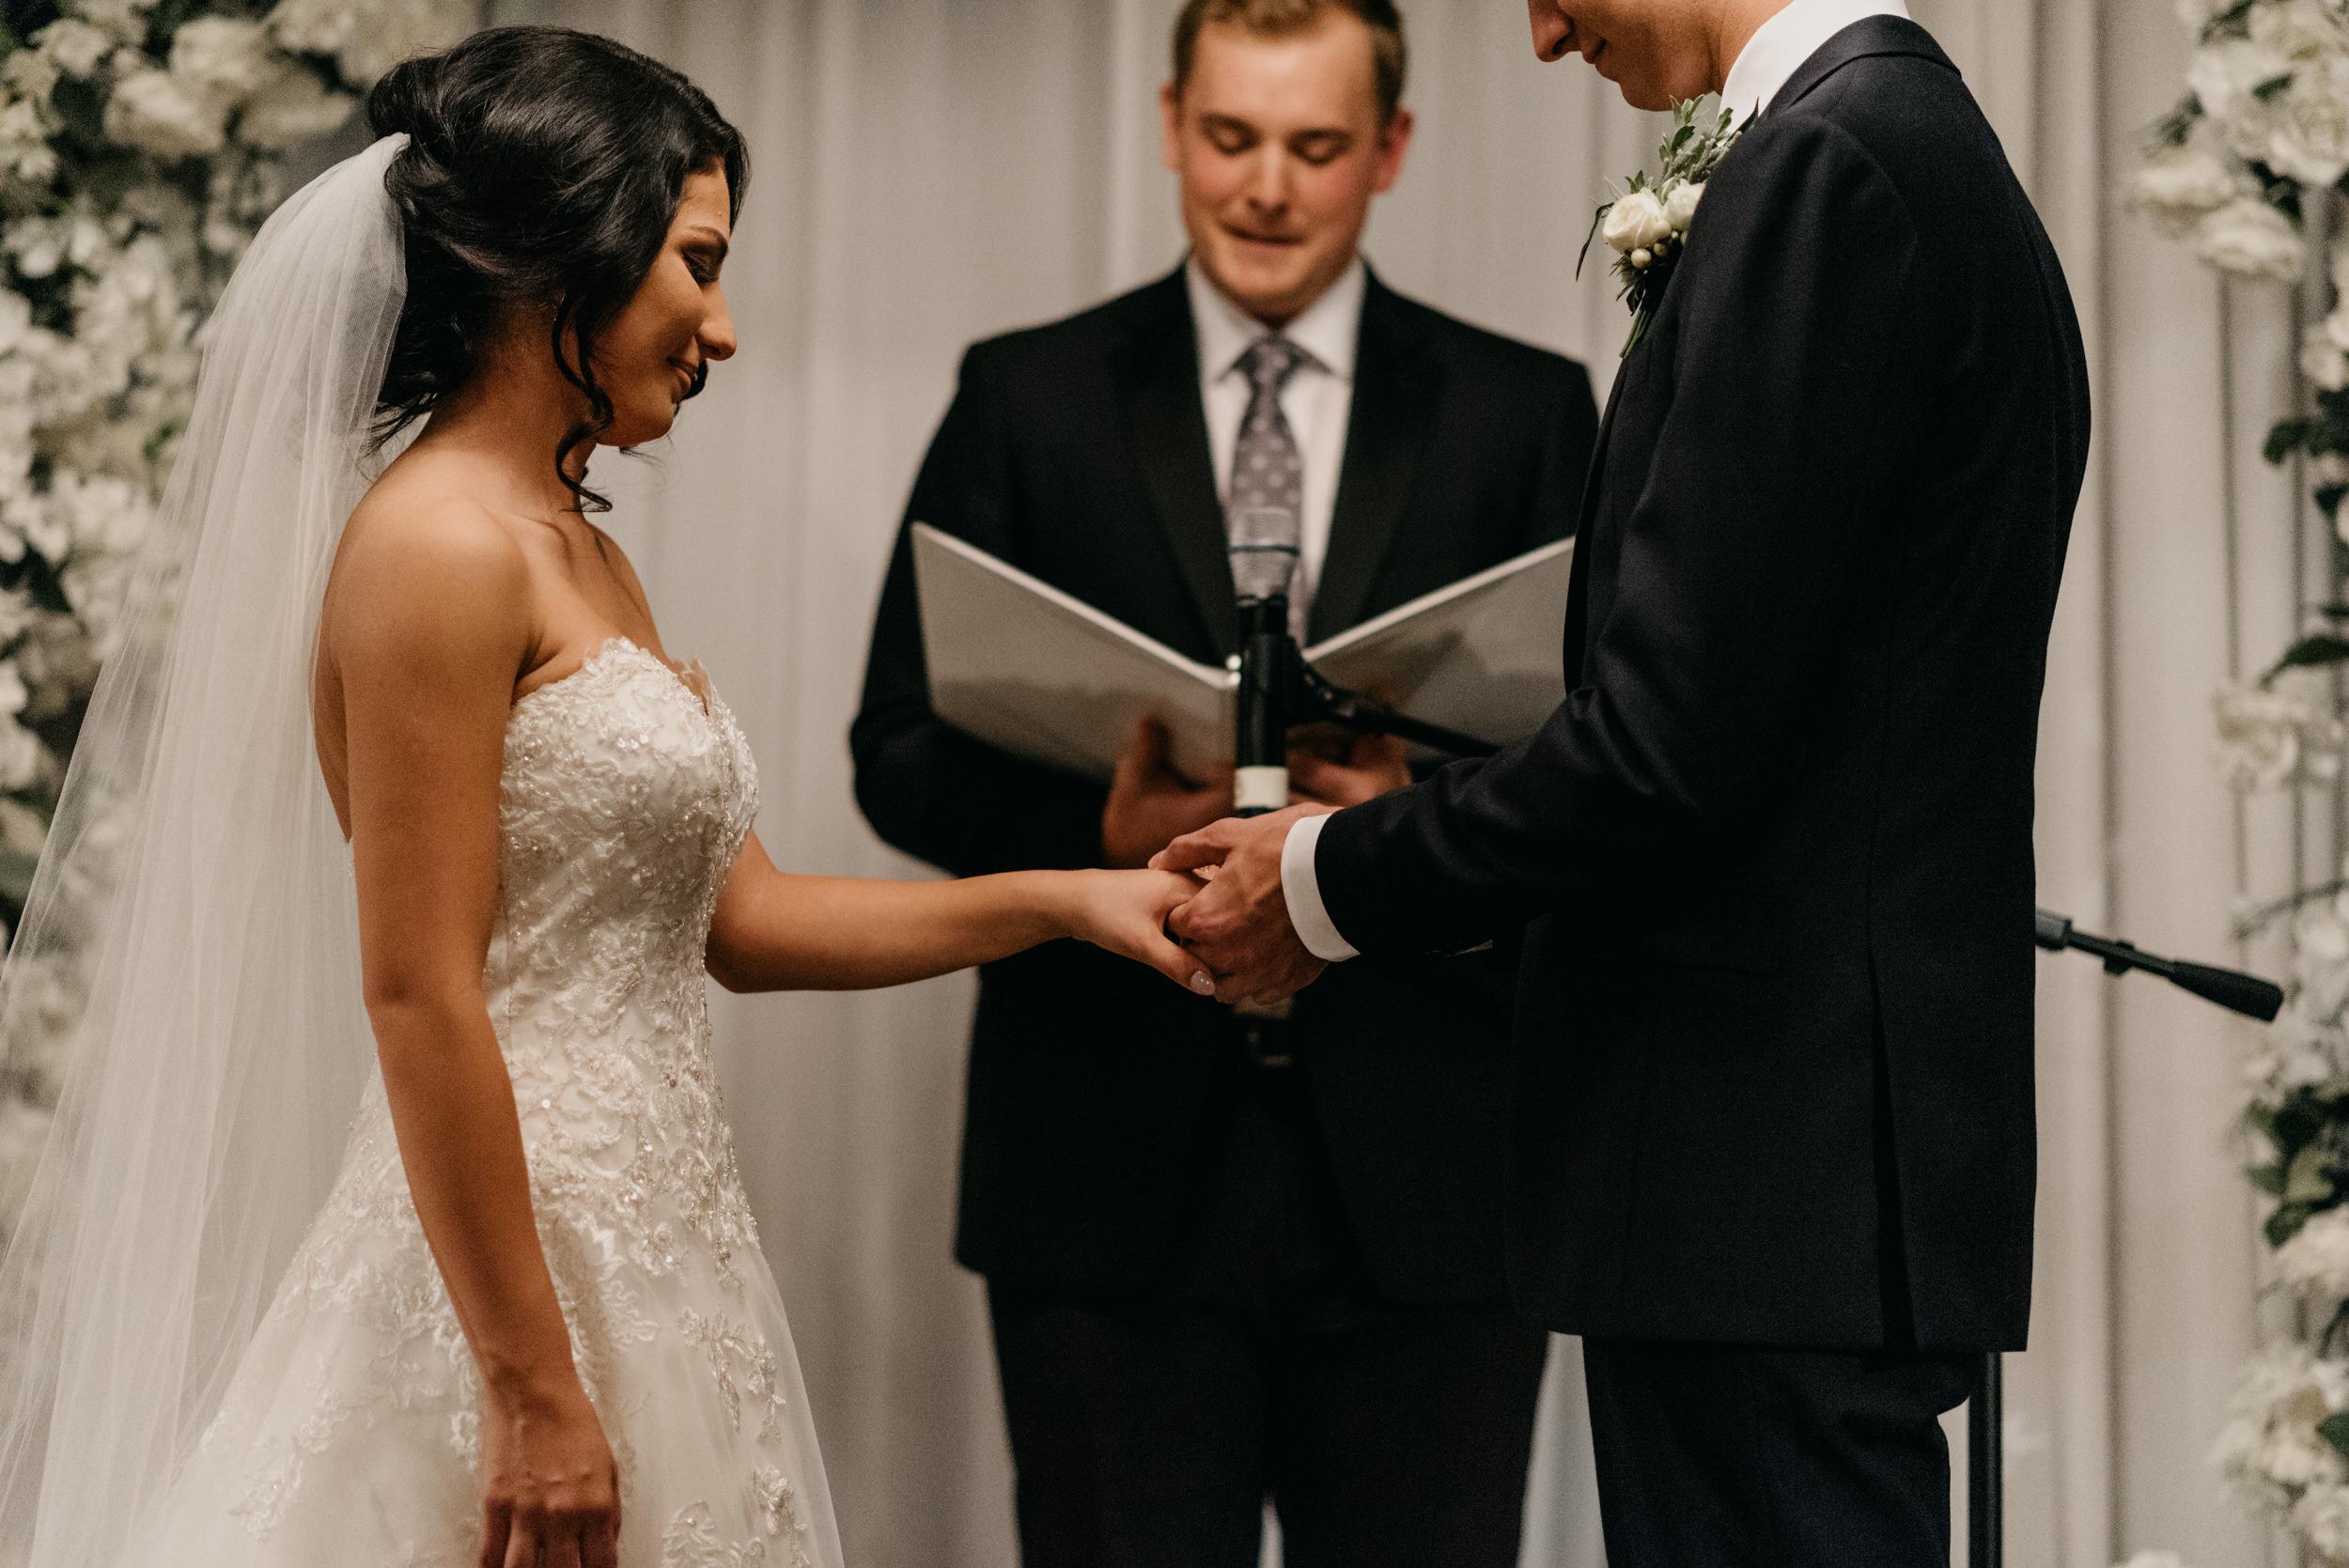 88-ceremony-west-end-ballroom-portland-wedding-venue-9214.jpg